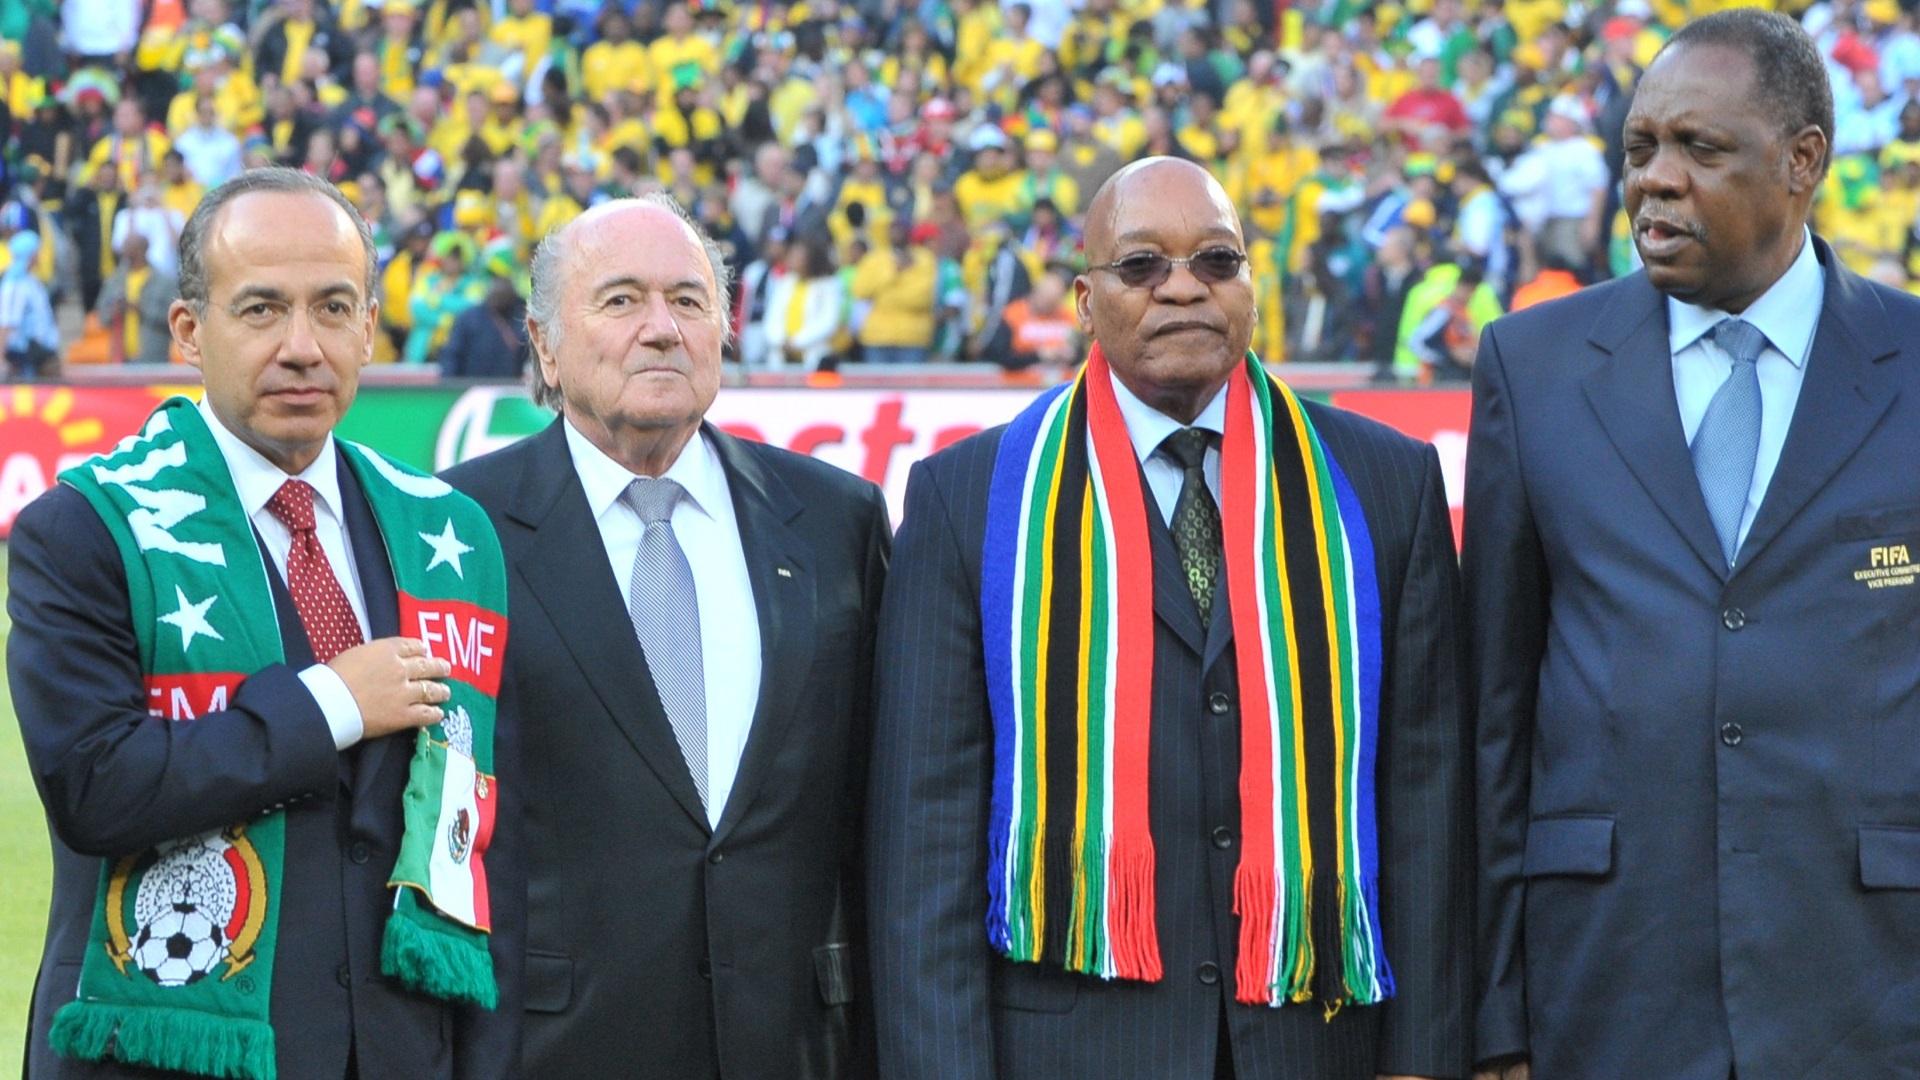 Mexican President Felipe Calderon, FIFA President Sepp Blatter, South Africa's President Jacob Zuma and CAF President Issa Hayatou